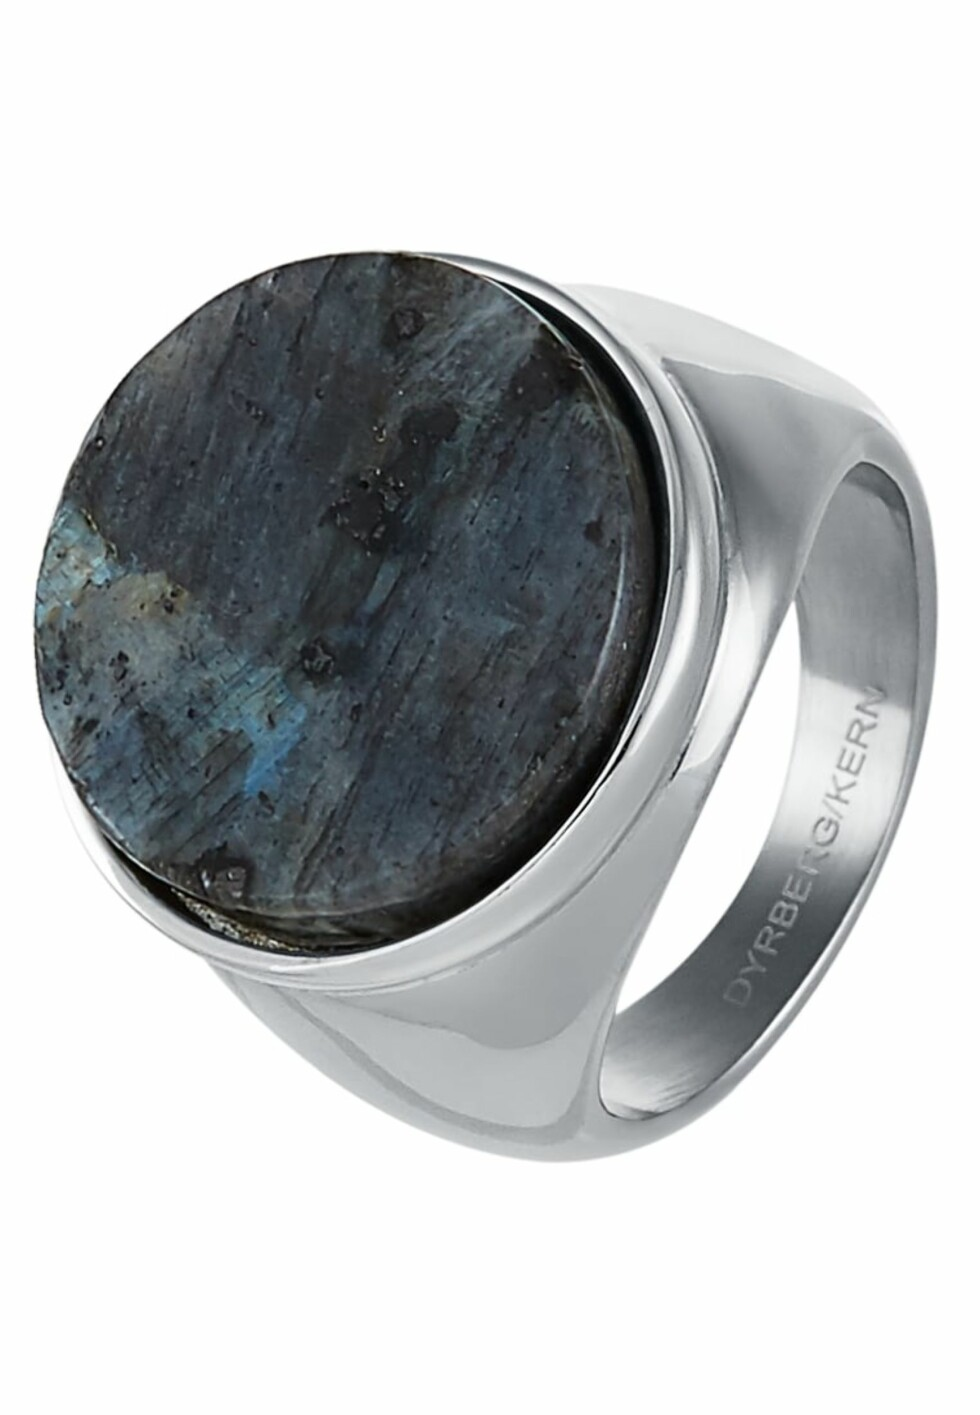 Ring fra Dyrberg/Kern via Zalando.no | kr 749 | http://marketing.net.zalando.no/ts/i4062628/tsc?amc=aff.znd.47259.54735.57747&rmd=3&trg=https%3A%2F%2Fwww.zalando.no%2Fdyrberg-kern-castor-ring-silver-coloured-dy351l019-d11.html%3Fwmc%3DAFF47_IG_NO.%23%7BPARTNER_ID%7D_%23%7BADSPACE_ID%7D..